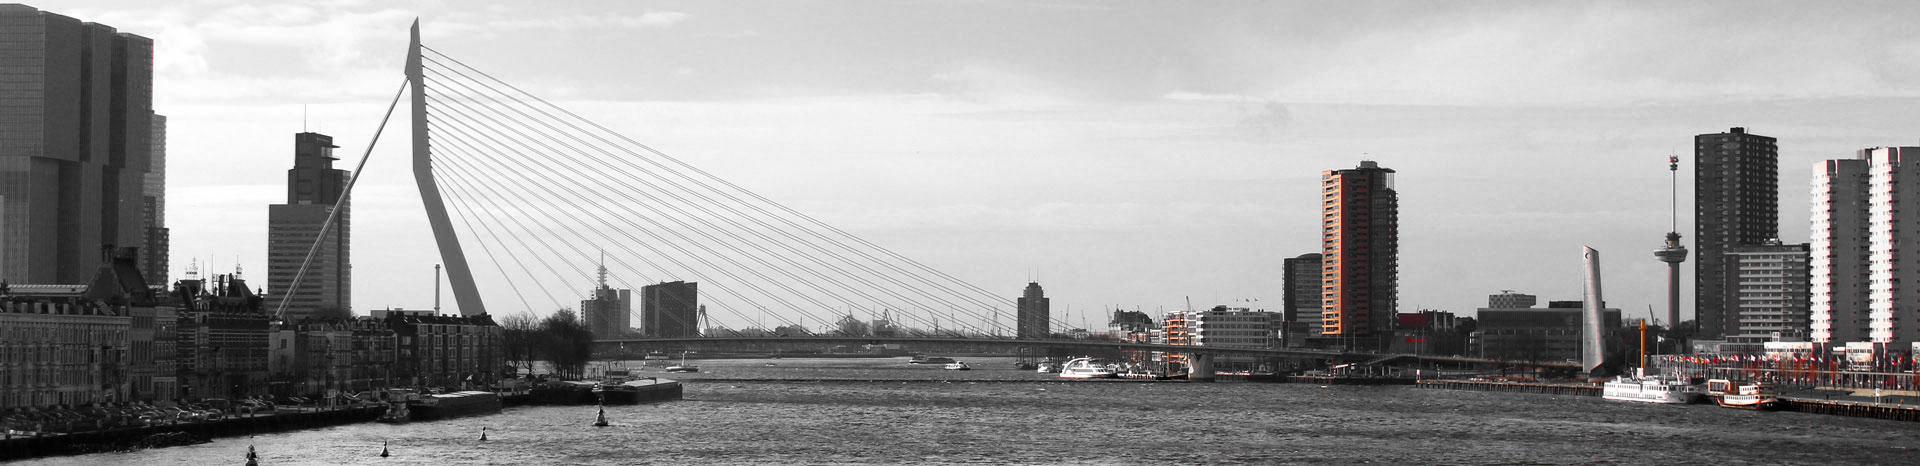 Letselschade advocaat Rotterdam | LetselPro